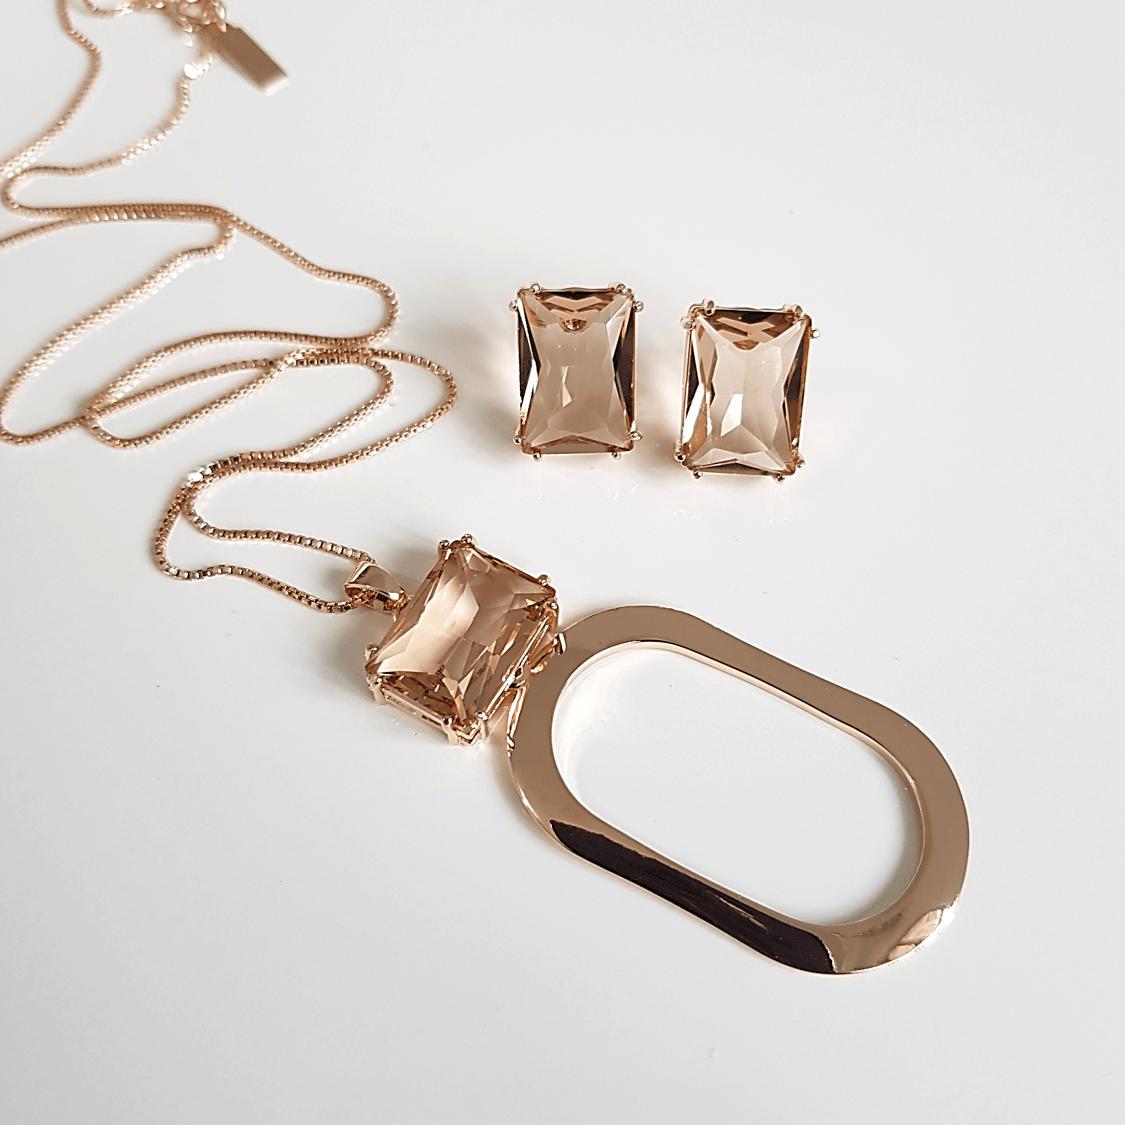 1-Conjunto colar e brinco de cristal champanhe - retangular